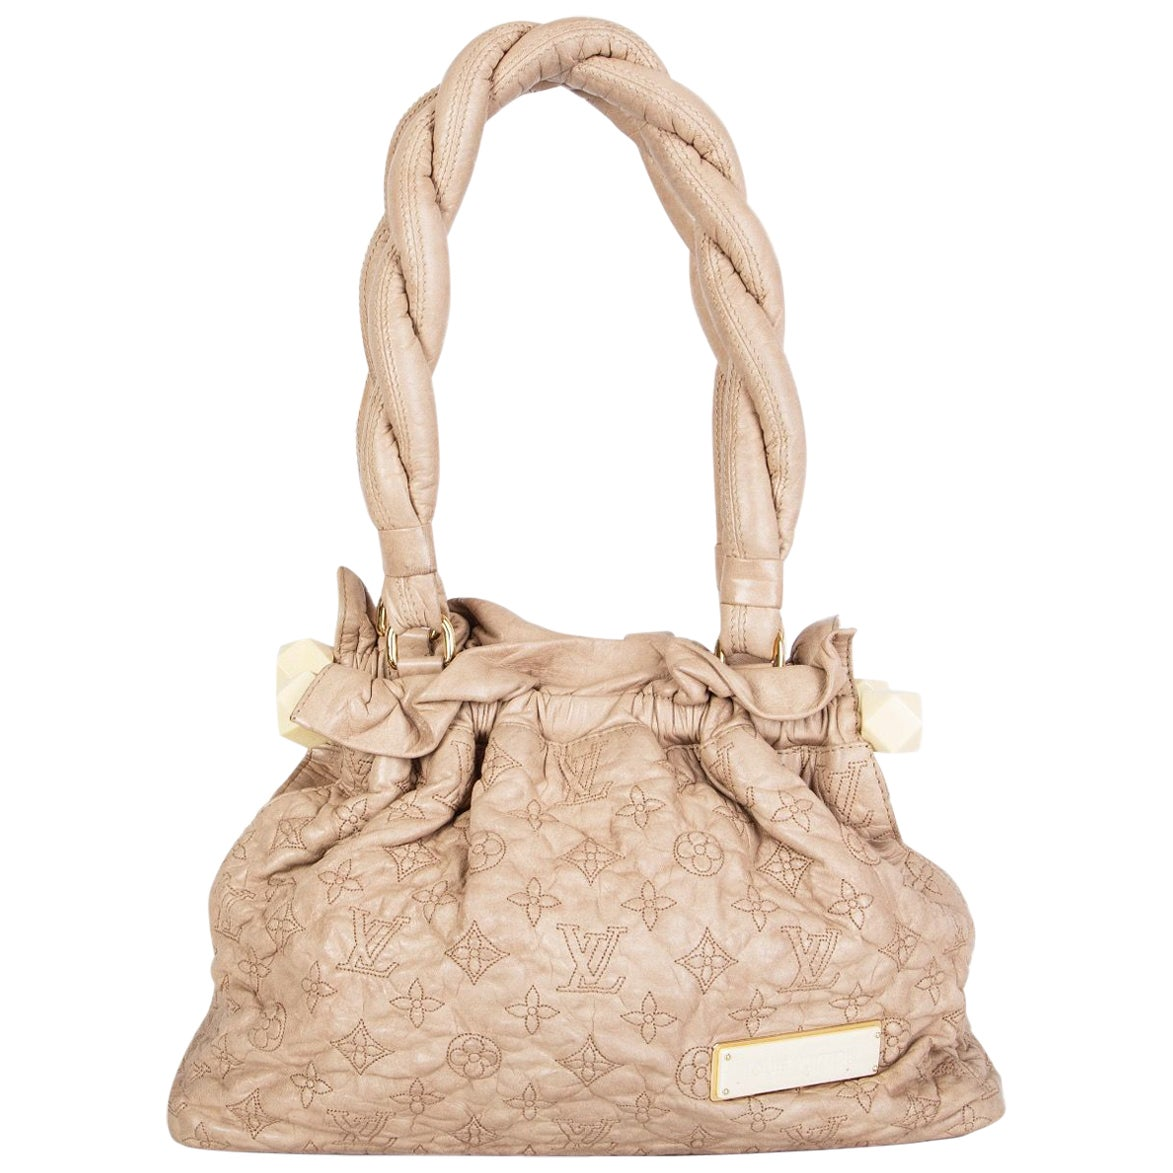 LOUIS VUITTON beige leather STRATUS Monogram OLYMPE PM Shoulder Bag LTD ED